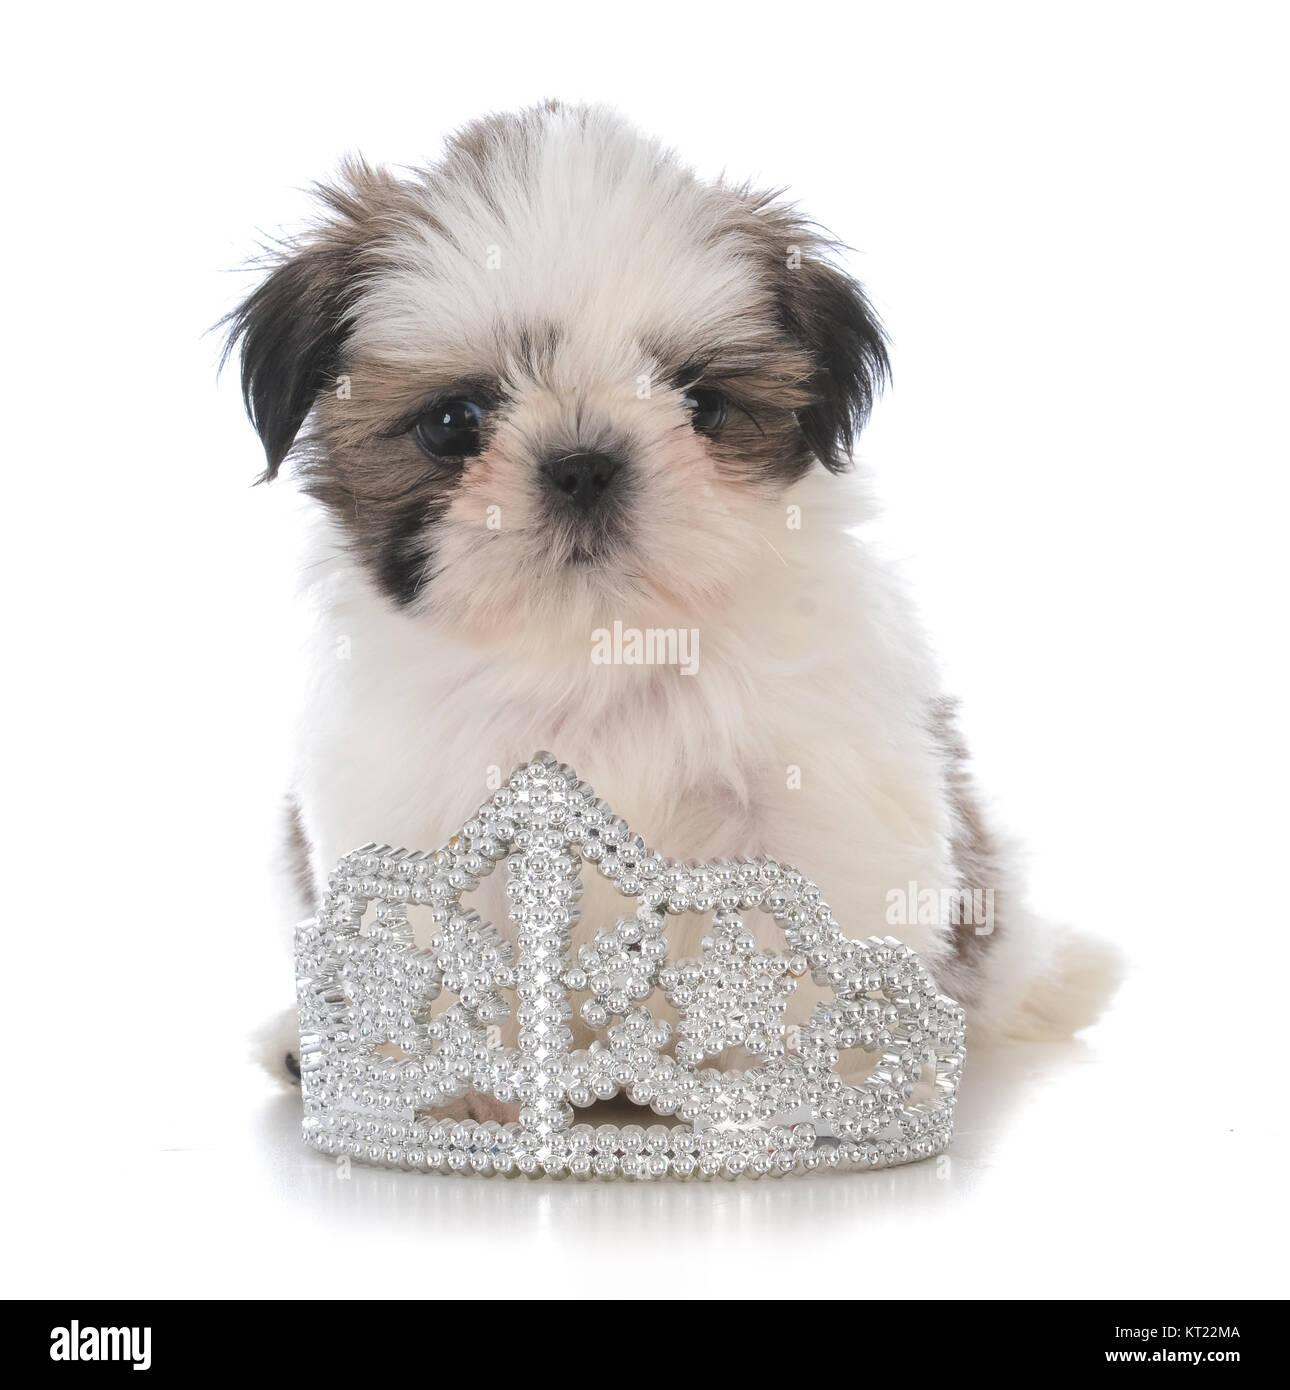 Female Shih Tzu Puppy Sitting Inside A Tiara On White Background